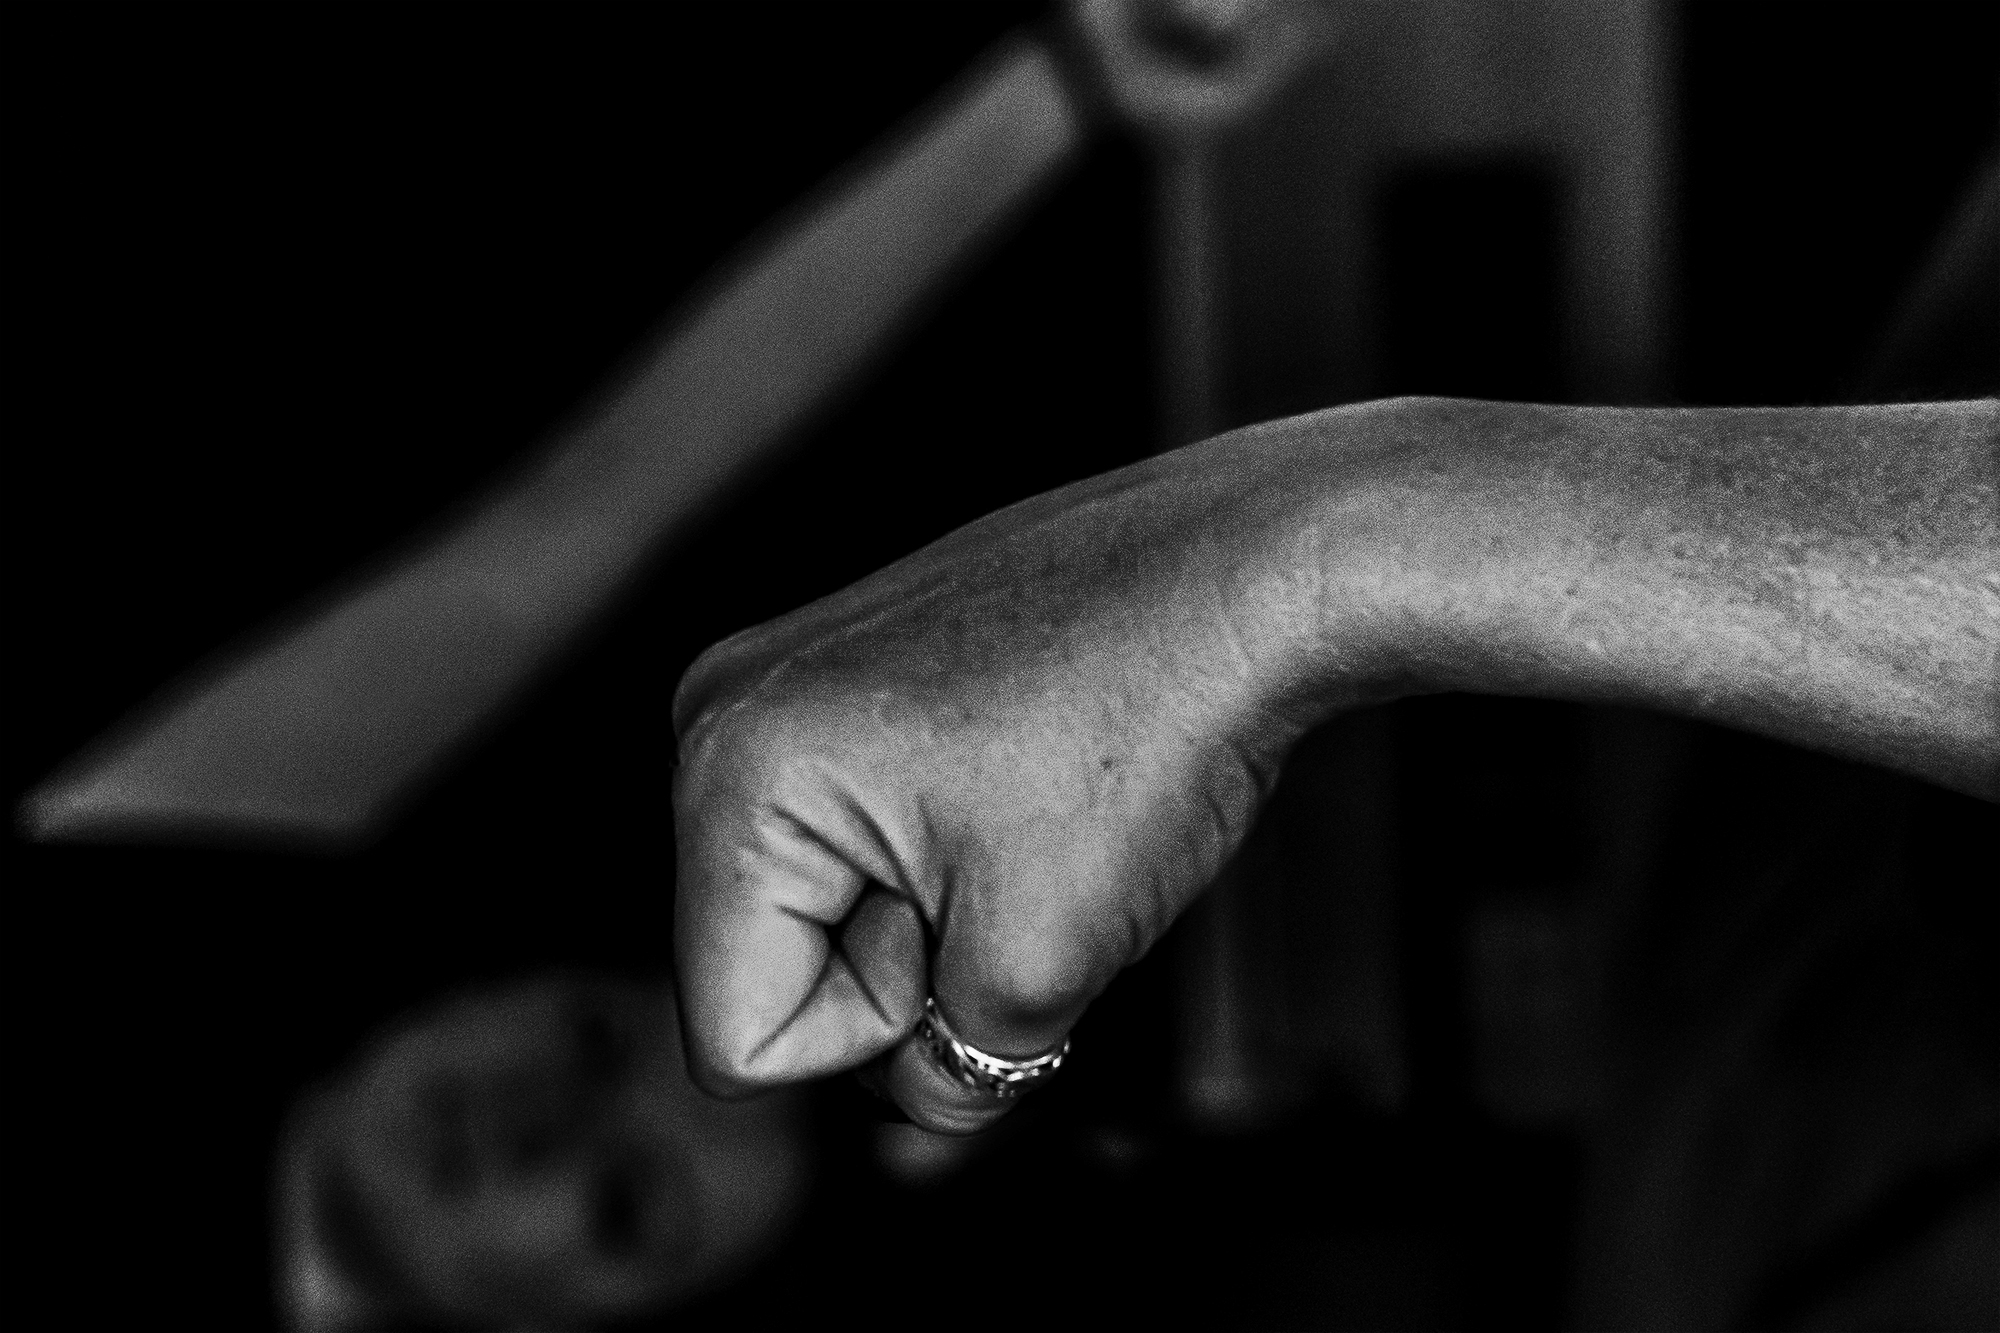 Judiths hand .jpg